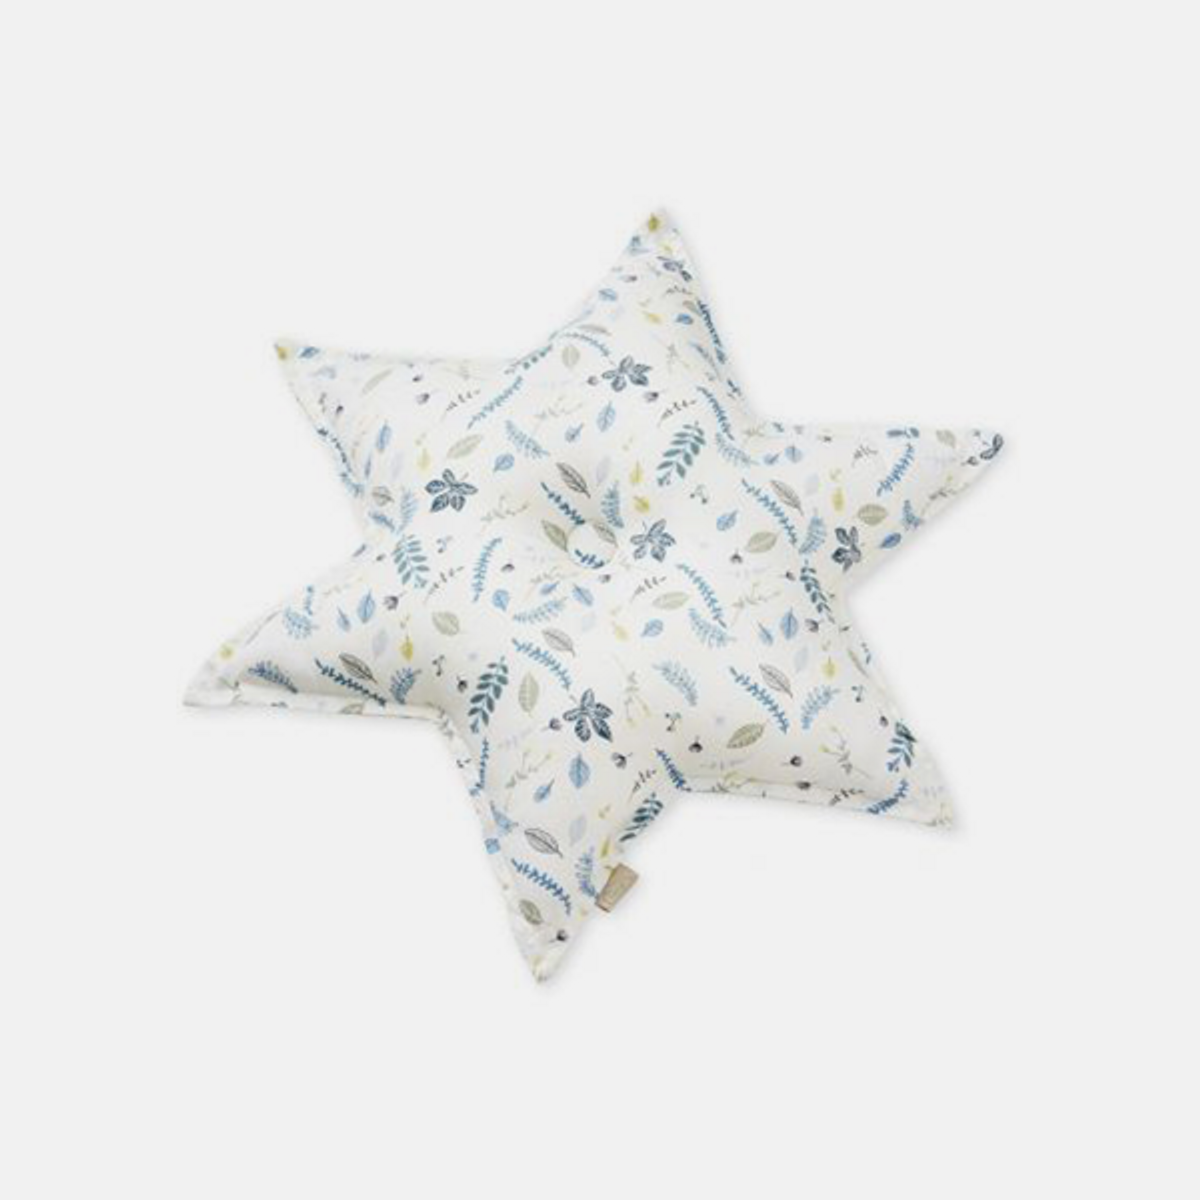 Pute Stjerne Pressed Leaves Blue